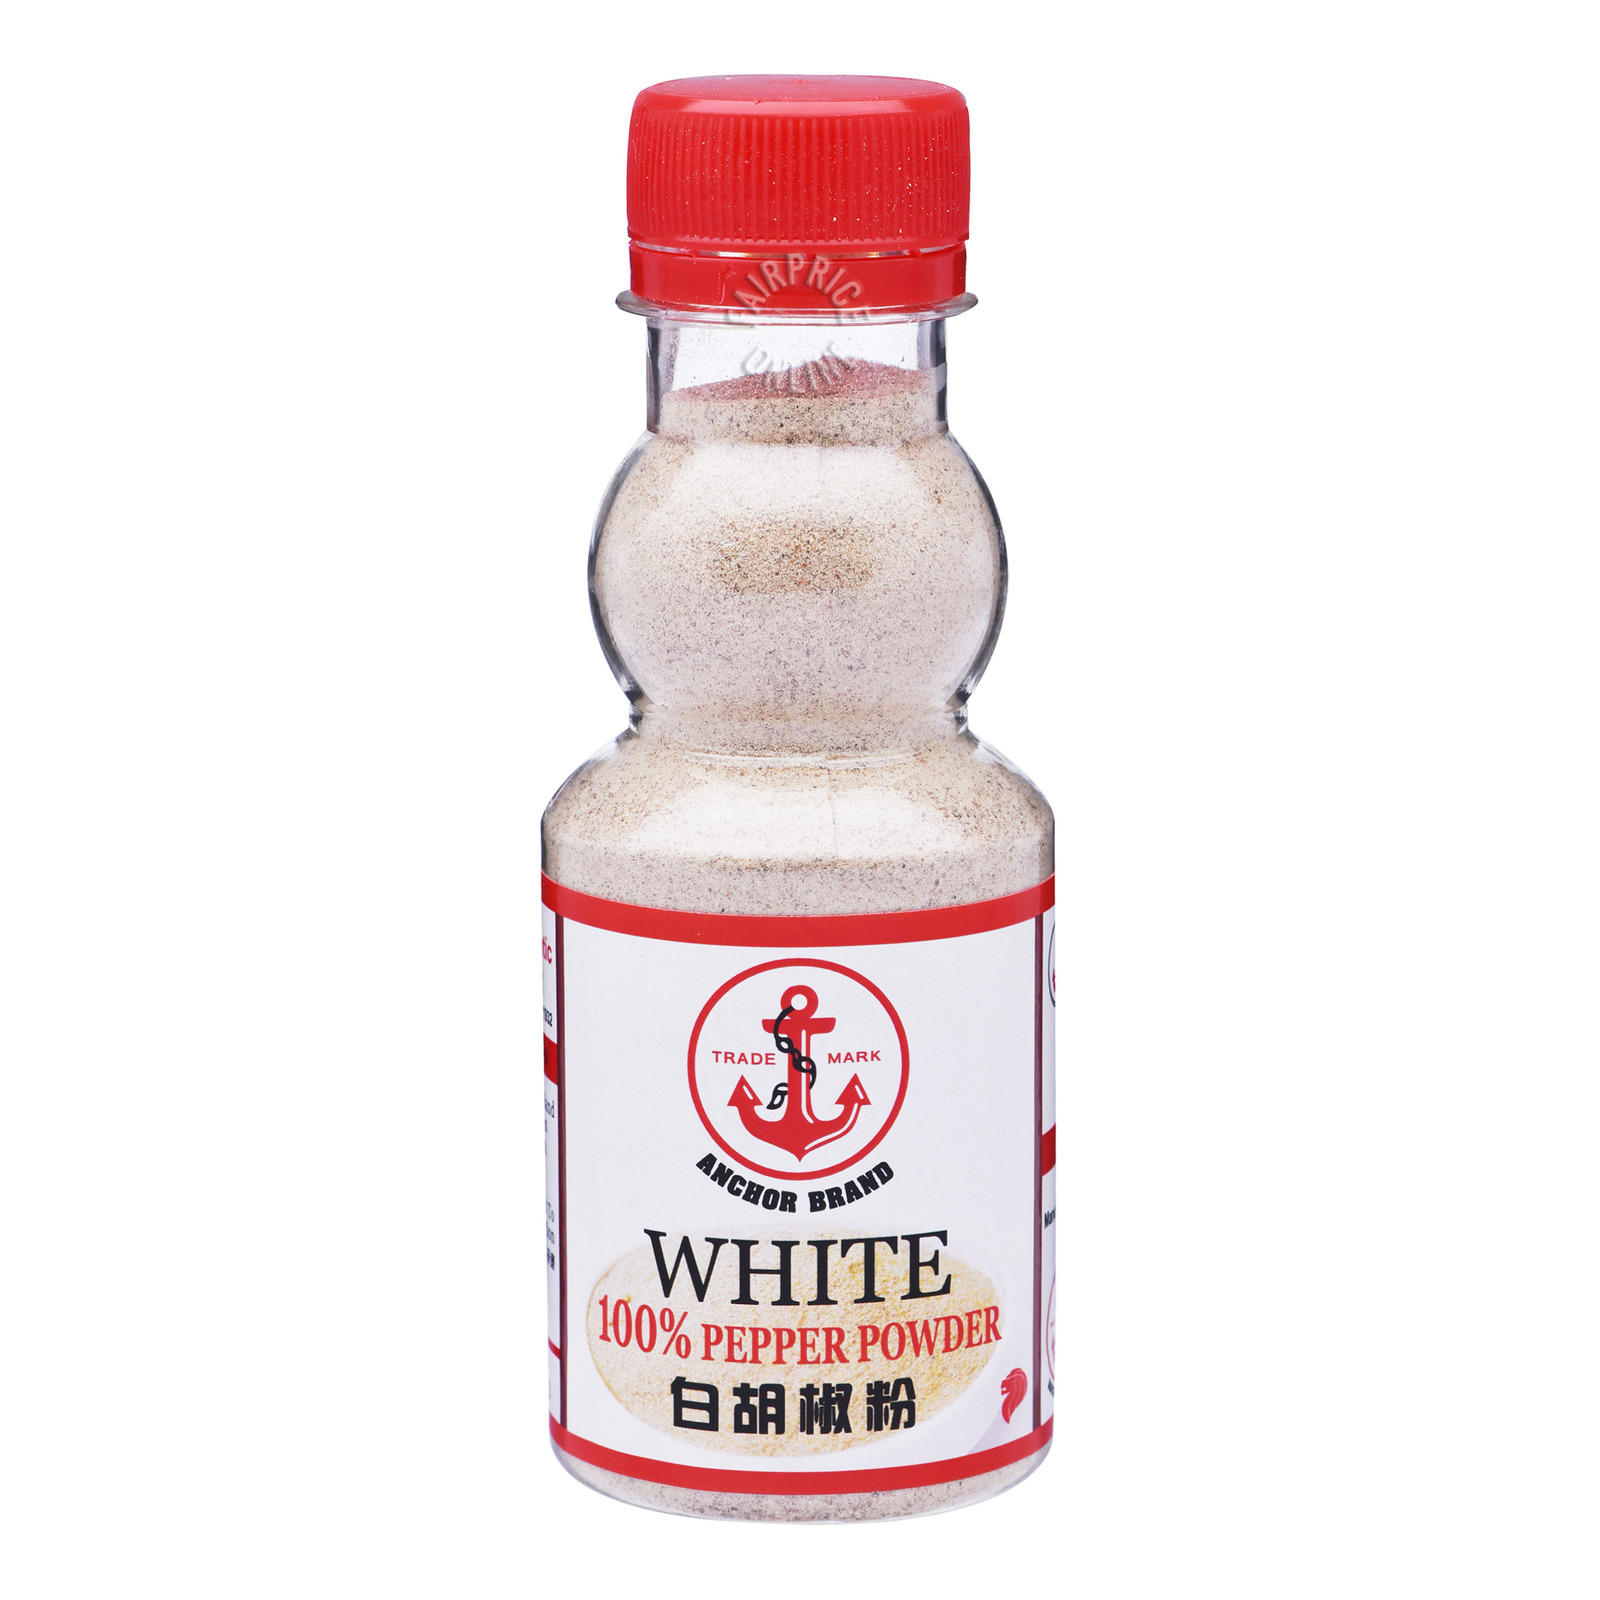 Anchor Brand Pepper Powder - White